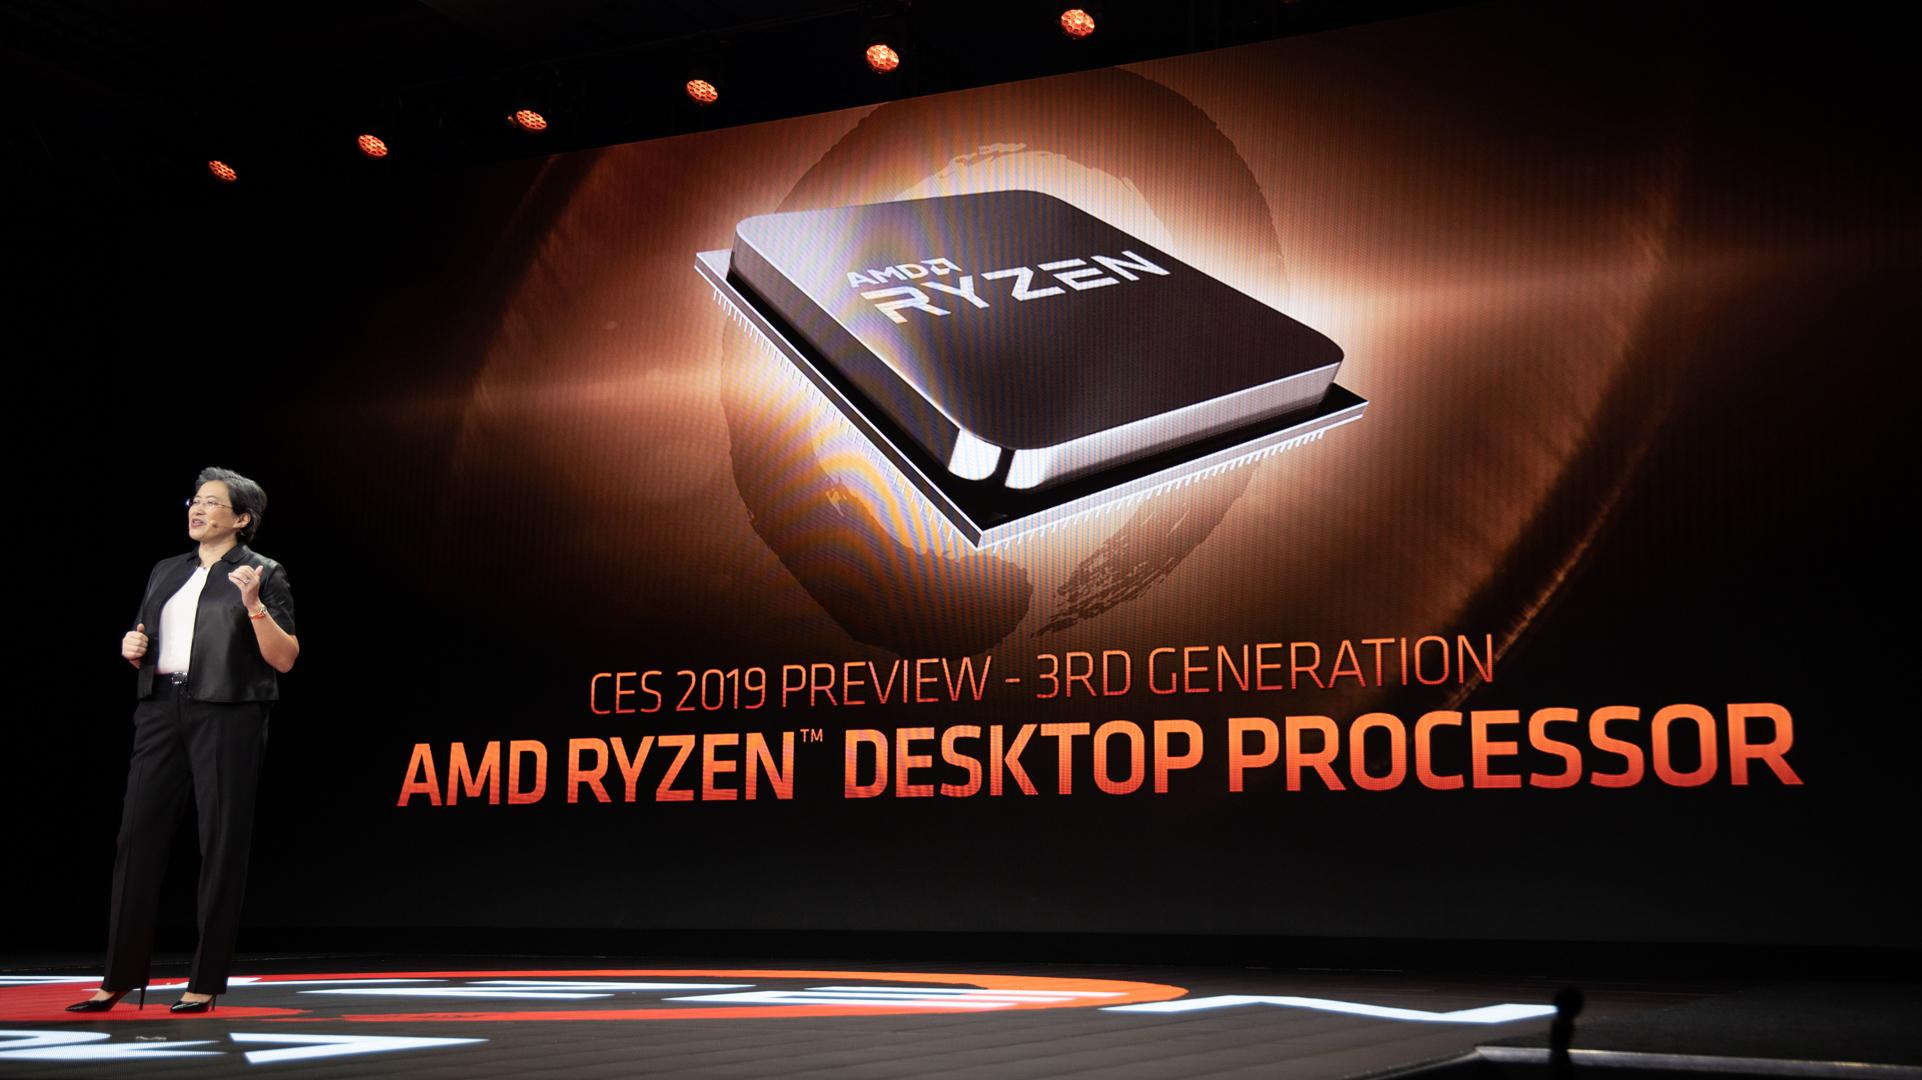 AMD Ryzen 3rd Generation